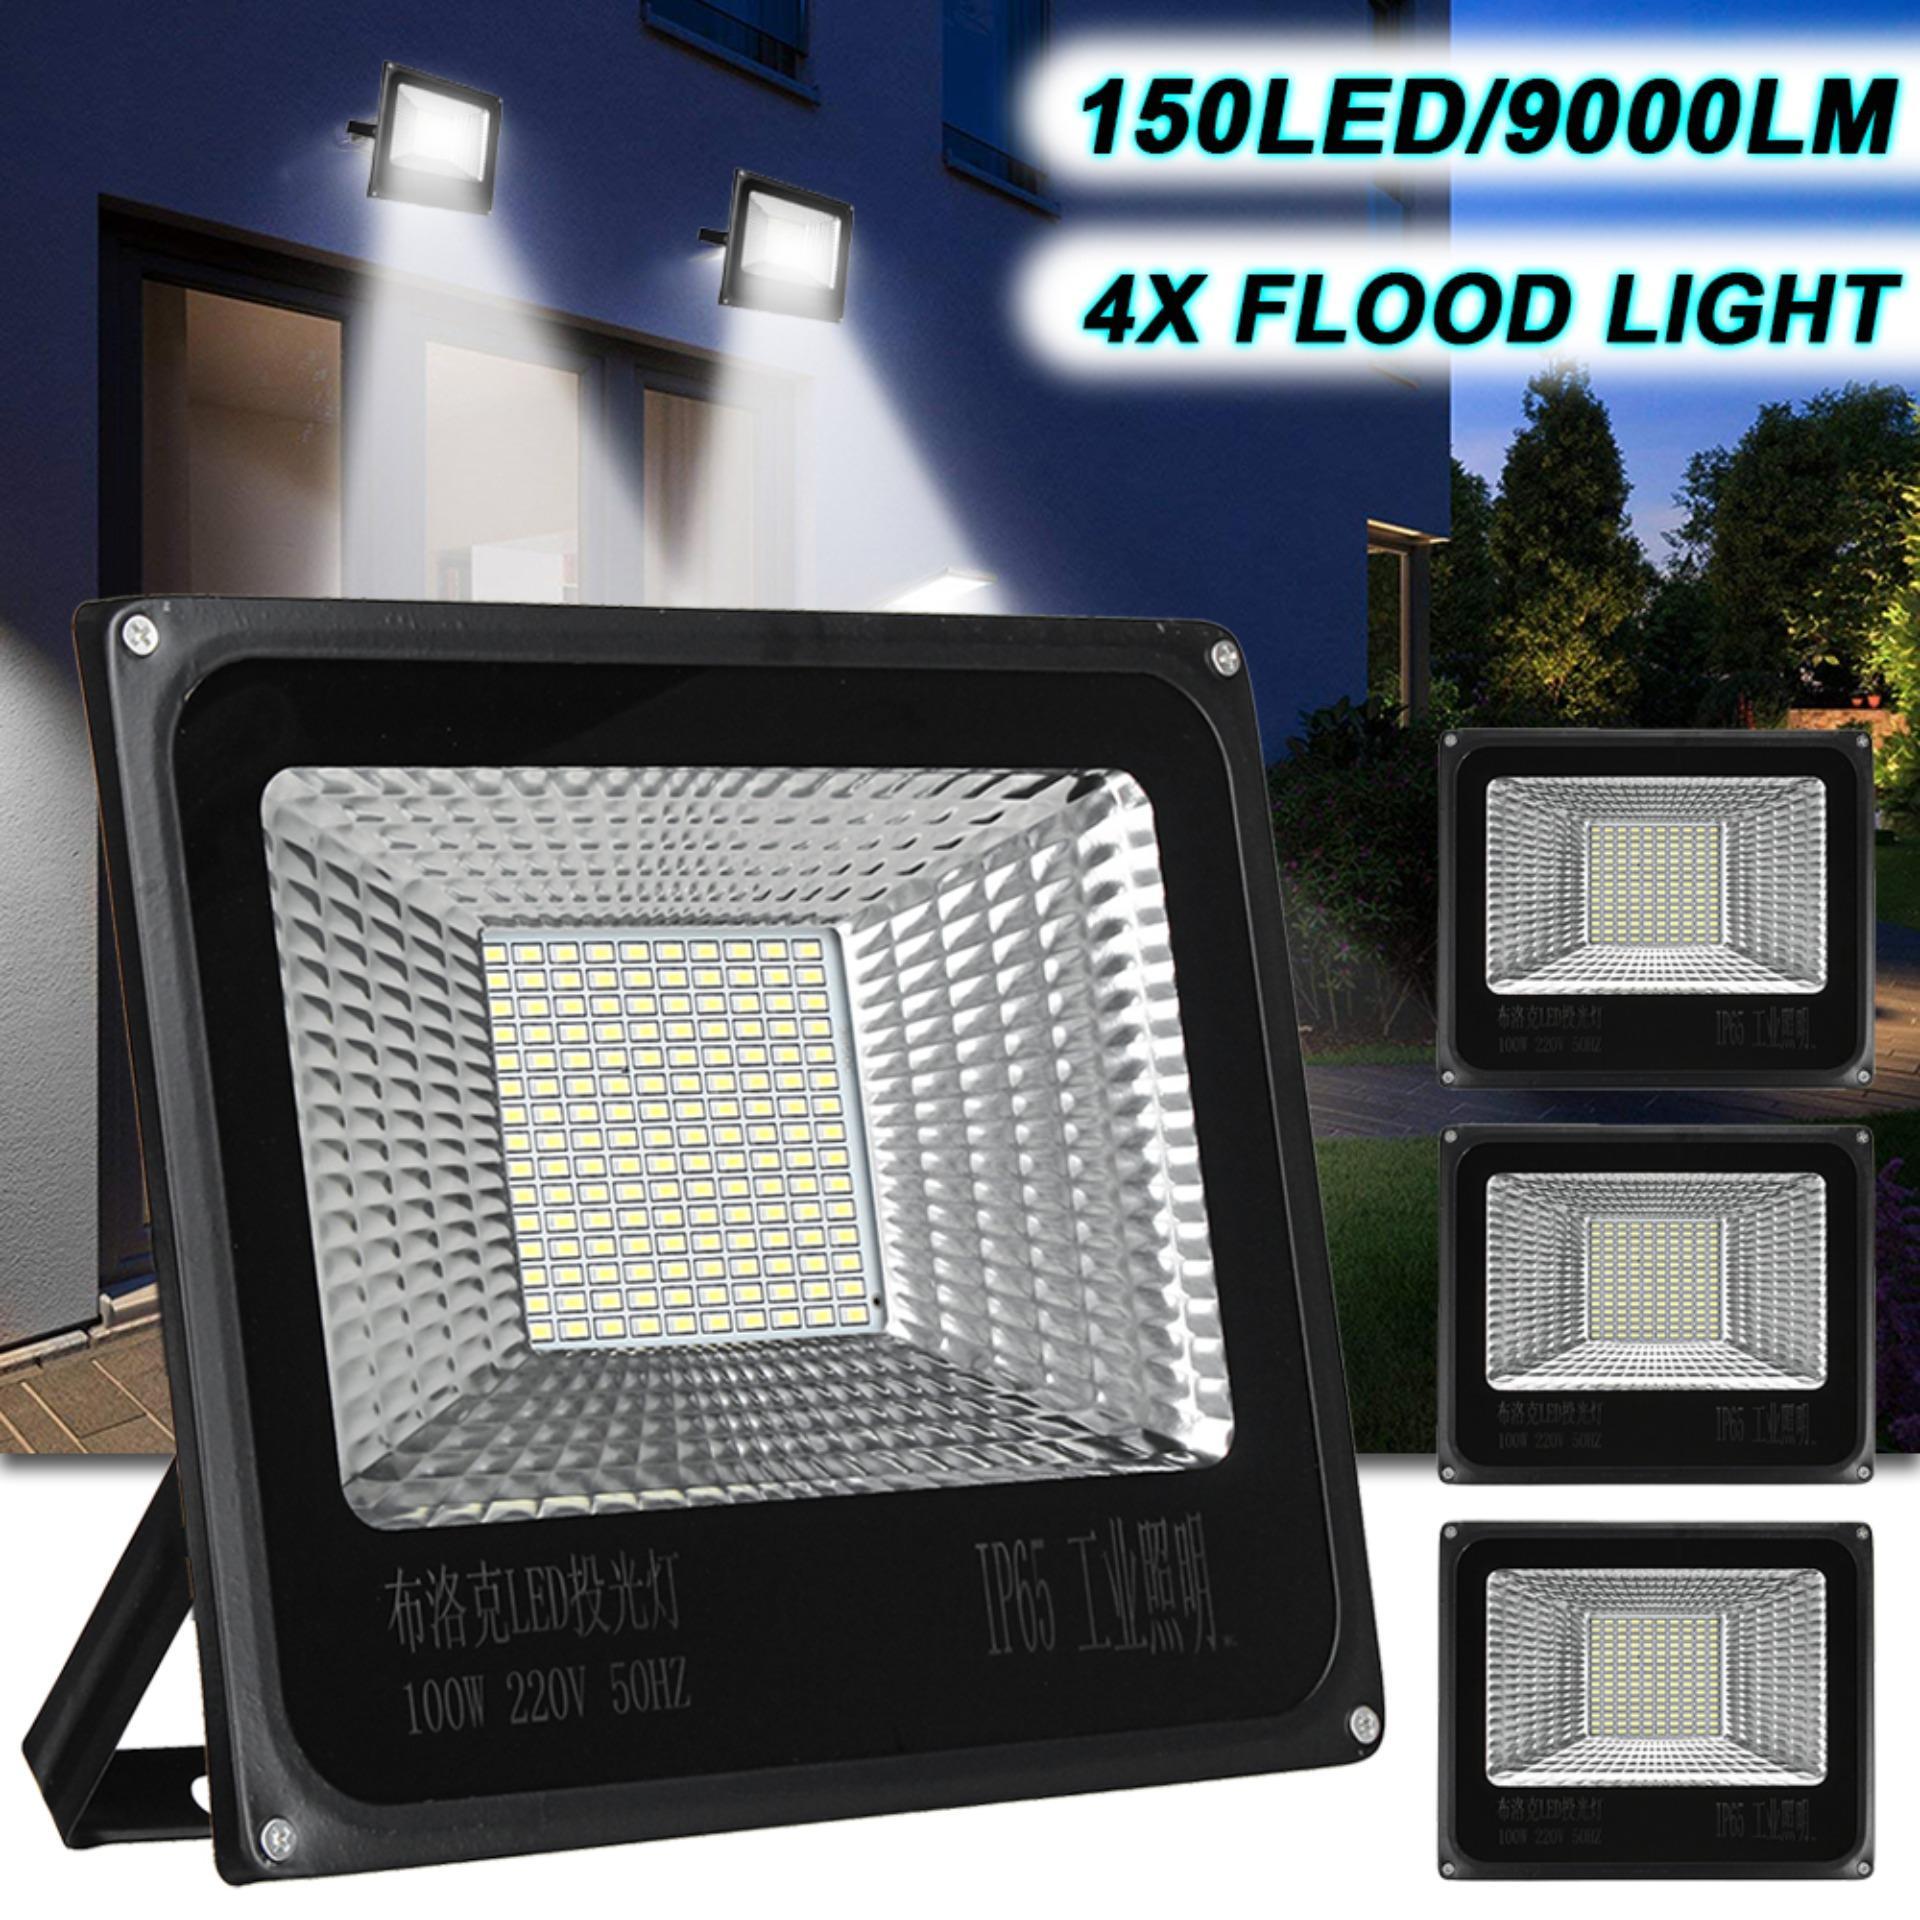 100W 150LED 9000LM Flood Light, IP65 Waterproof Outdoor Super Bright Security Lights Floodlight Landscape Wall Lights